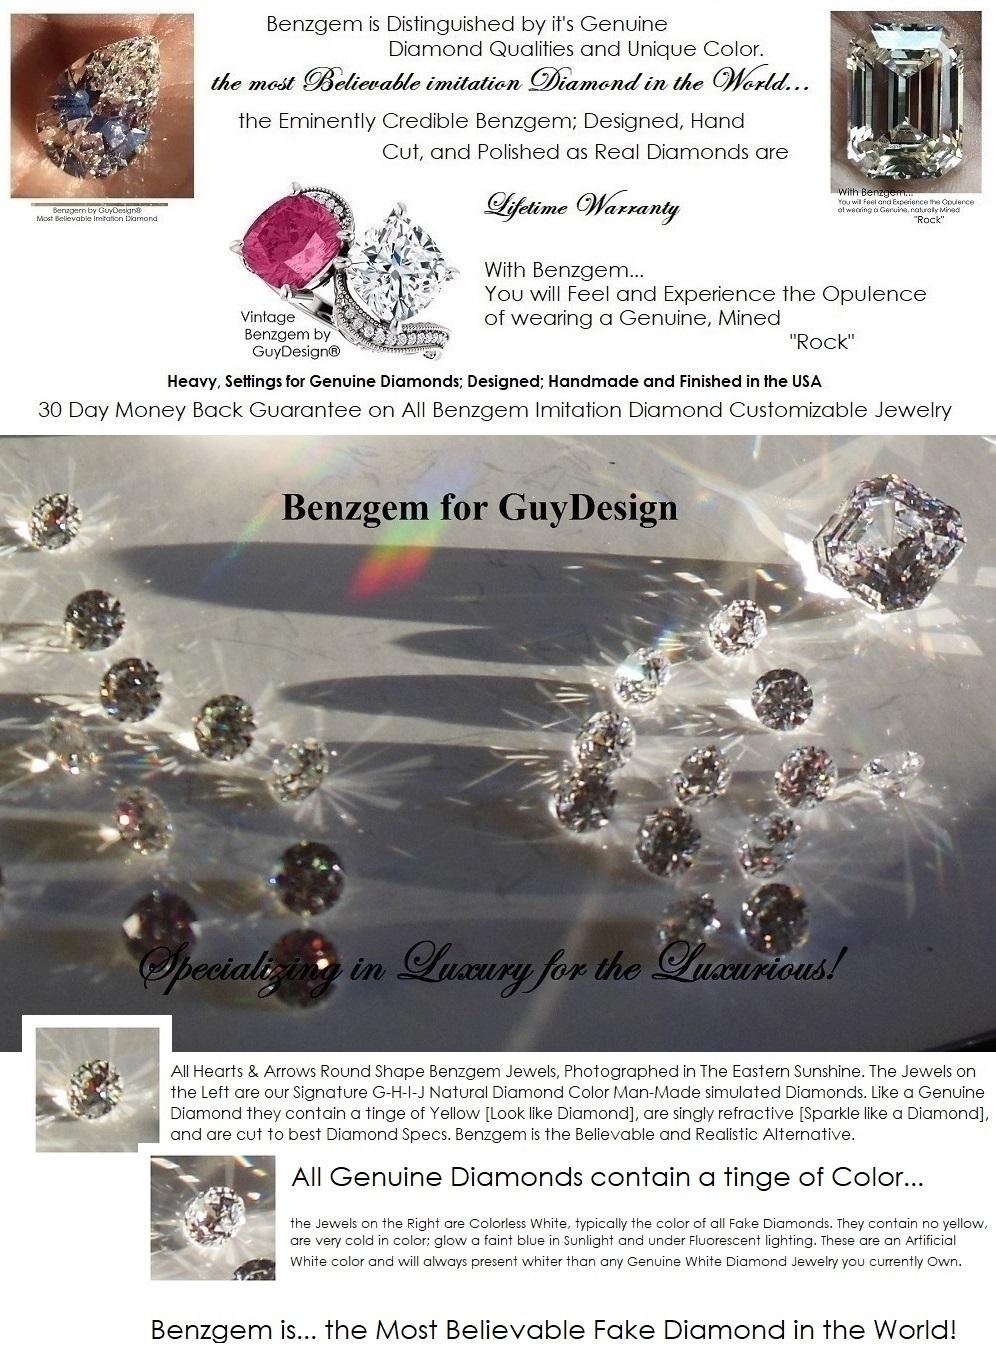 benzgem-by-guydesign-best-diamond-quality-imitation-diamond-30-day-money-back-guarantee-logo-banner-1.jpg